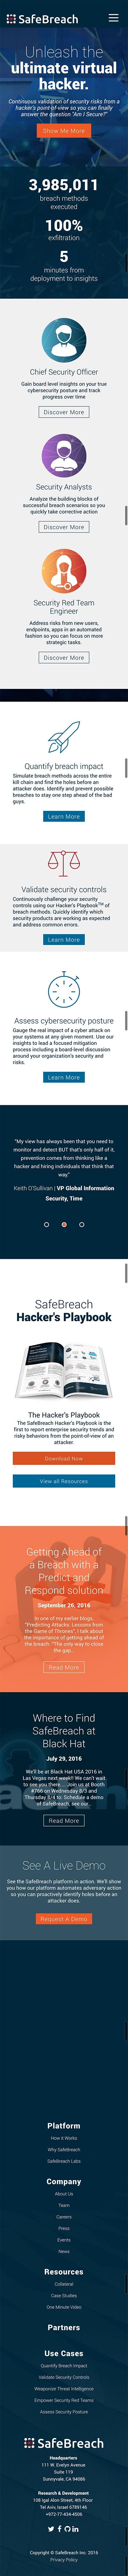 Safebreach Phone.jpg